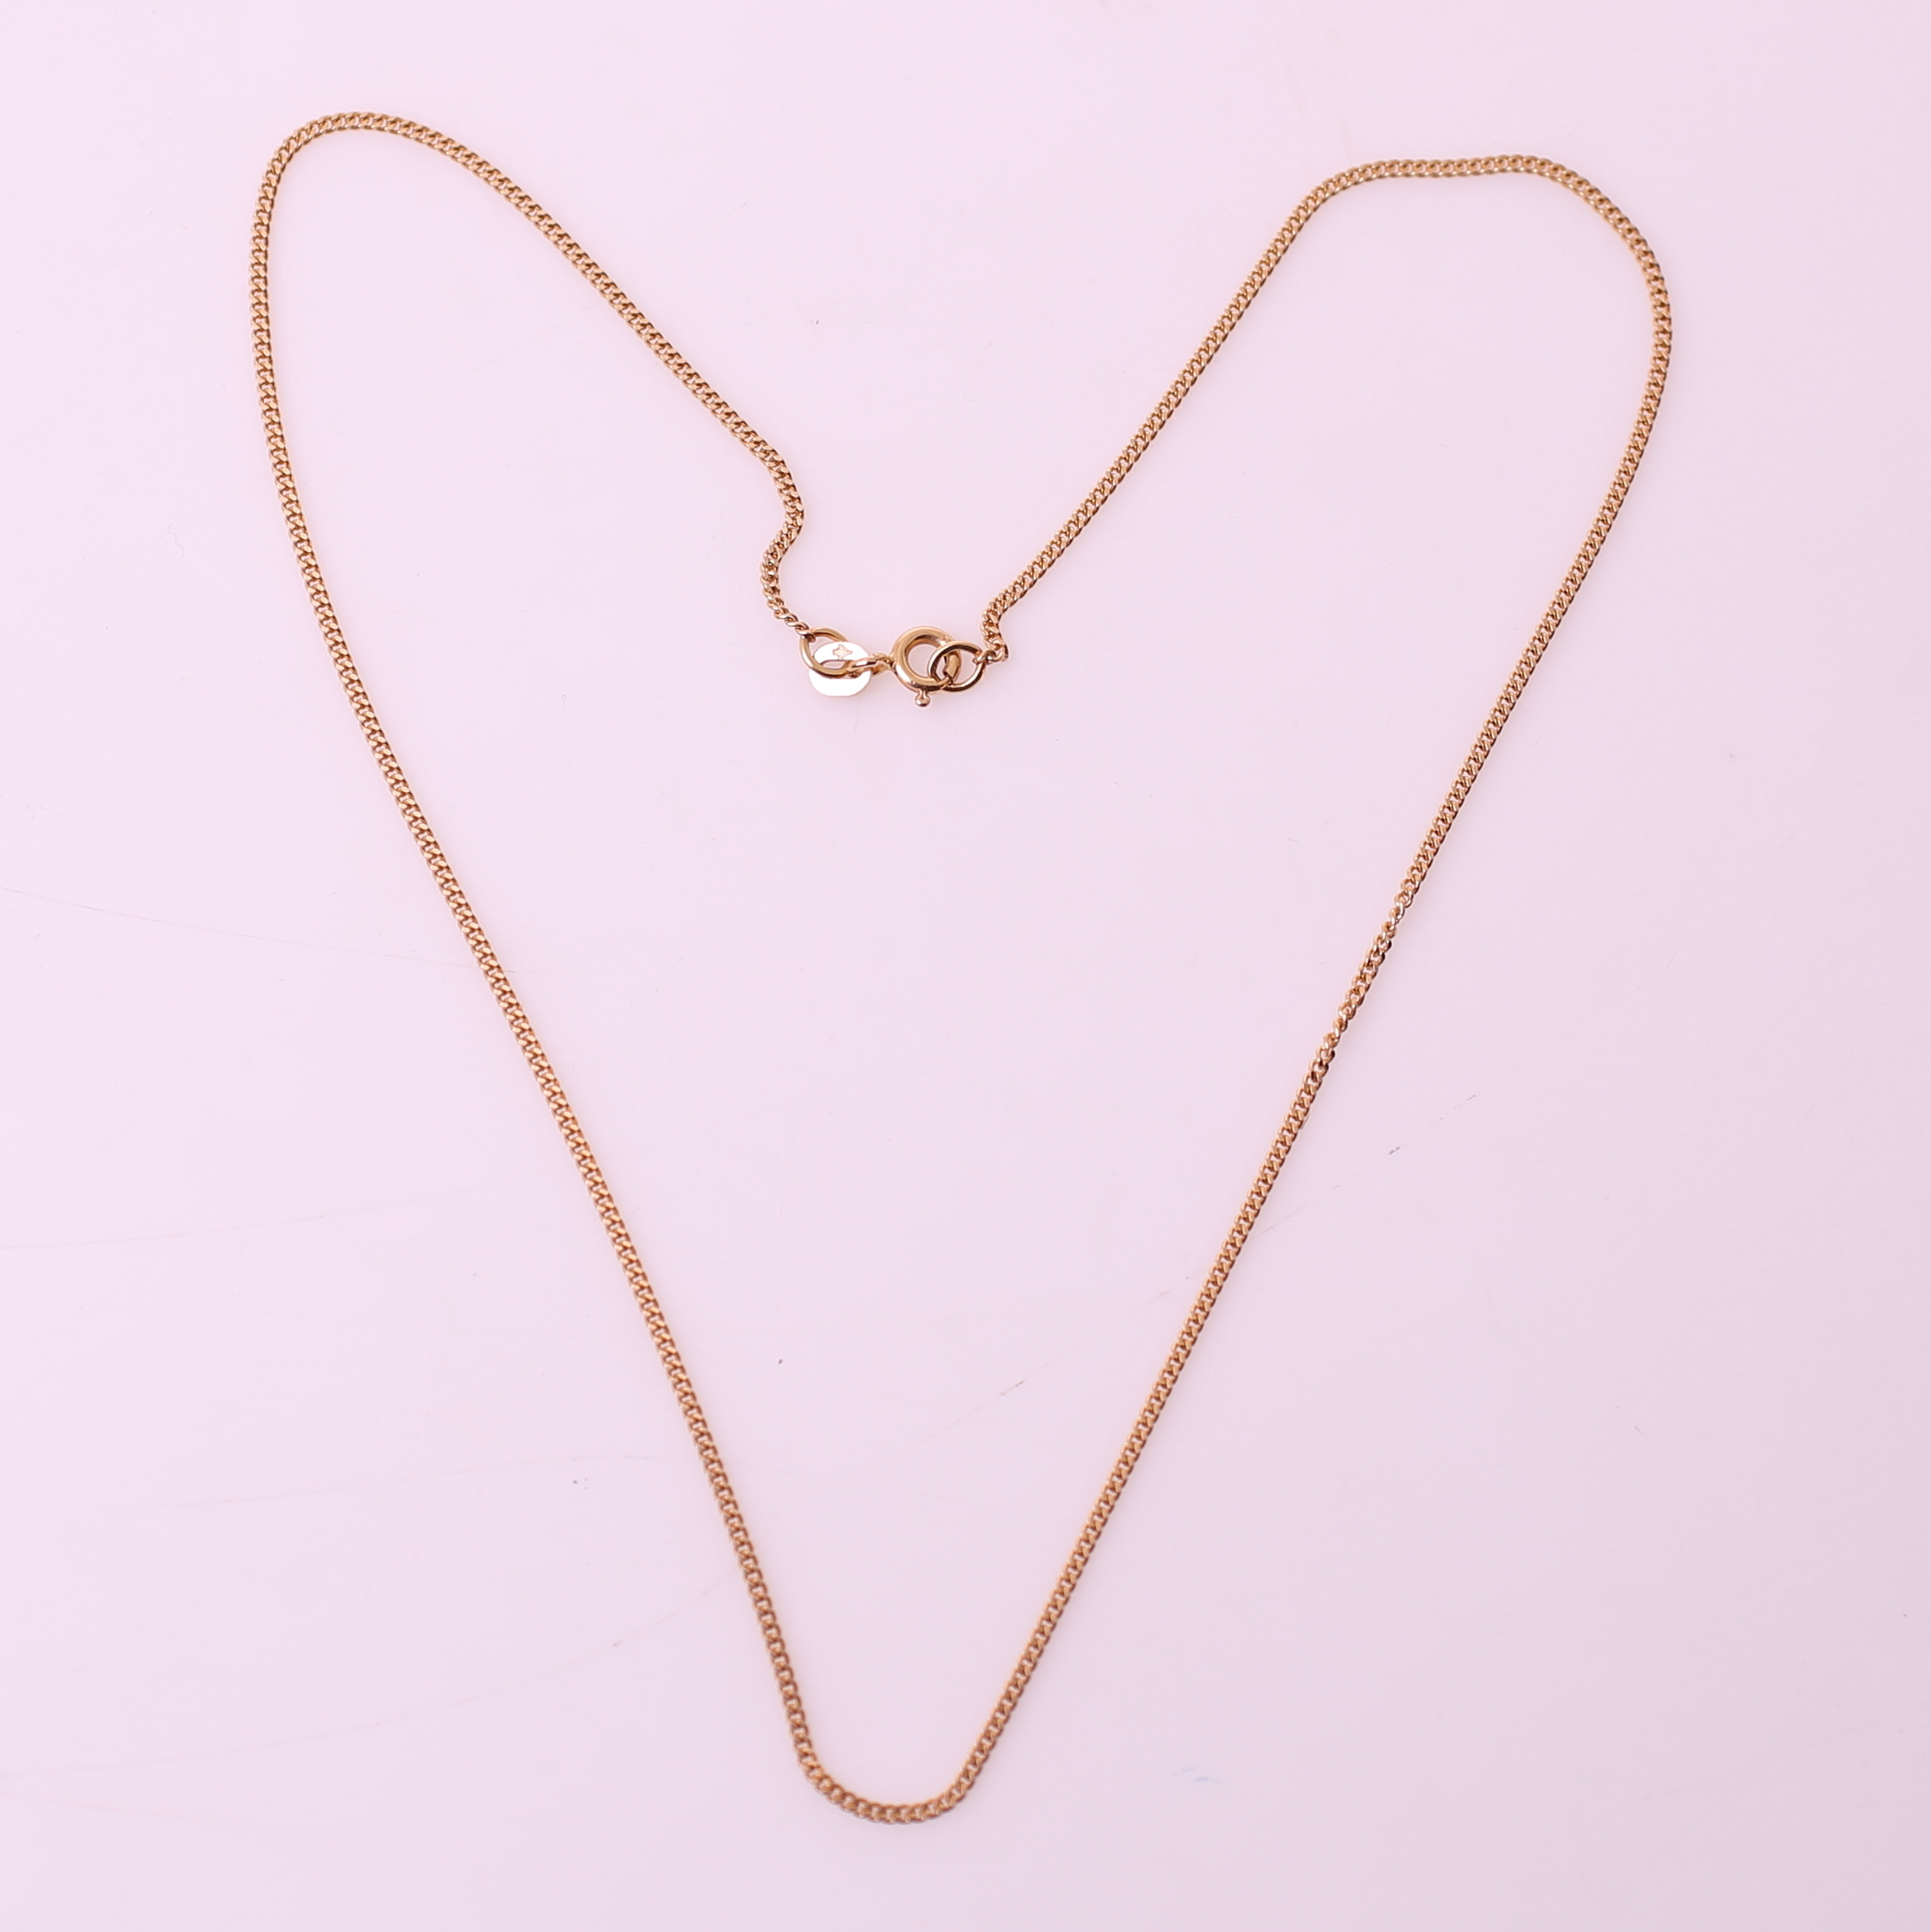 Dejlig HALSKEDJA, guld 18k (750), GFAB, vikt= 3,3 gram. Jewellery GV-29